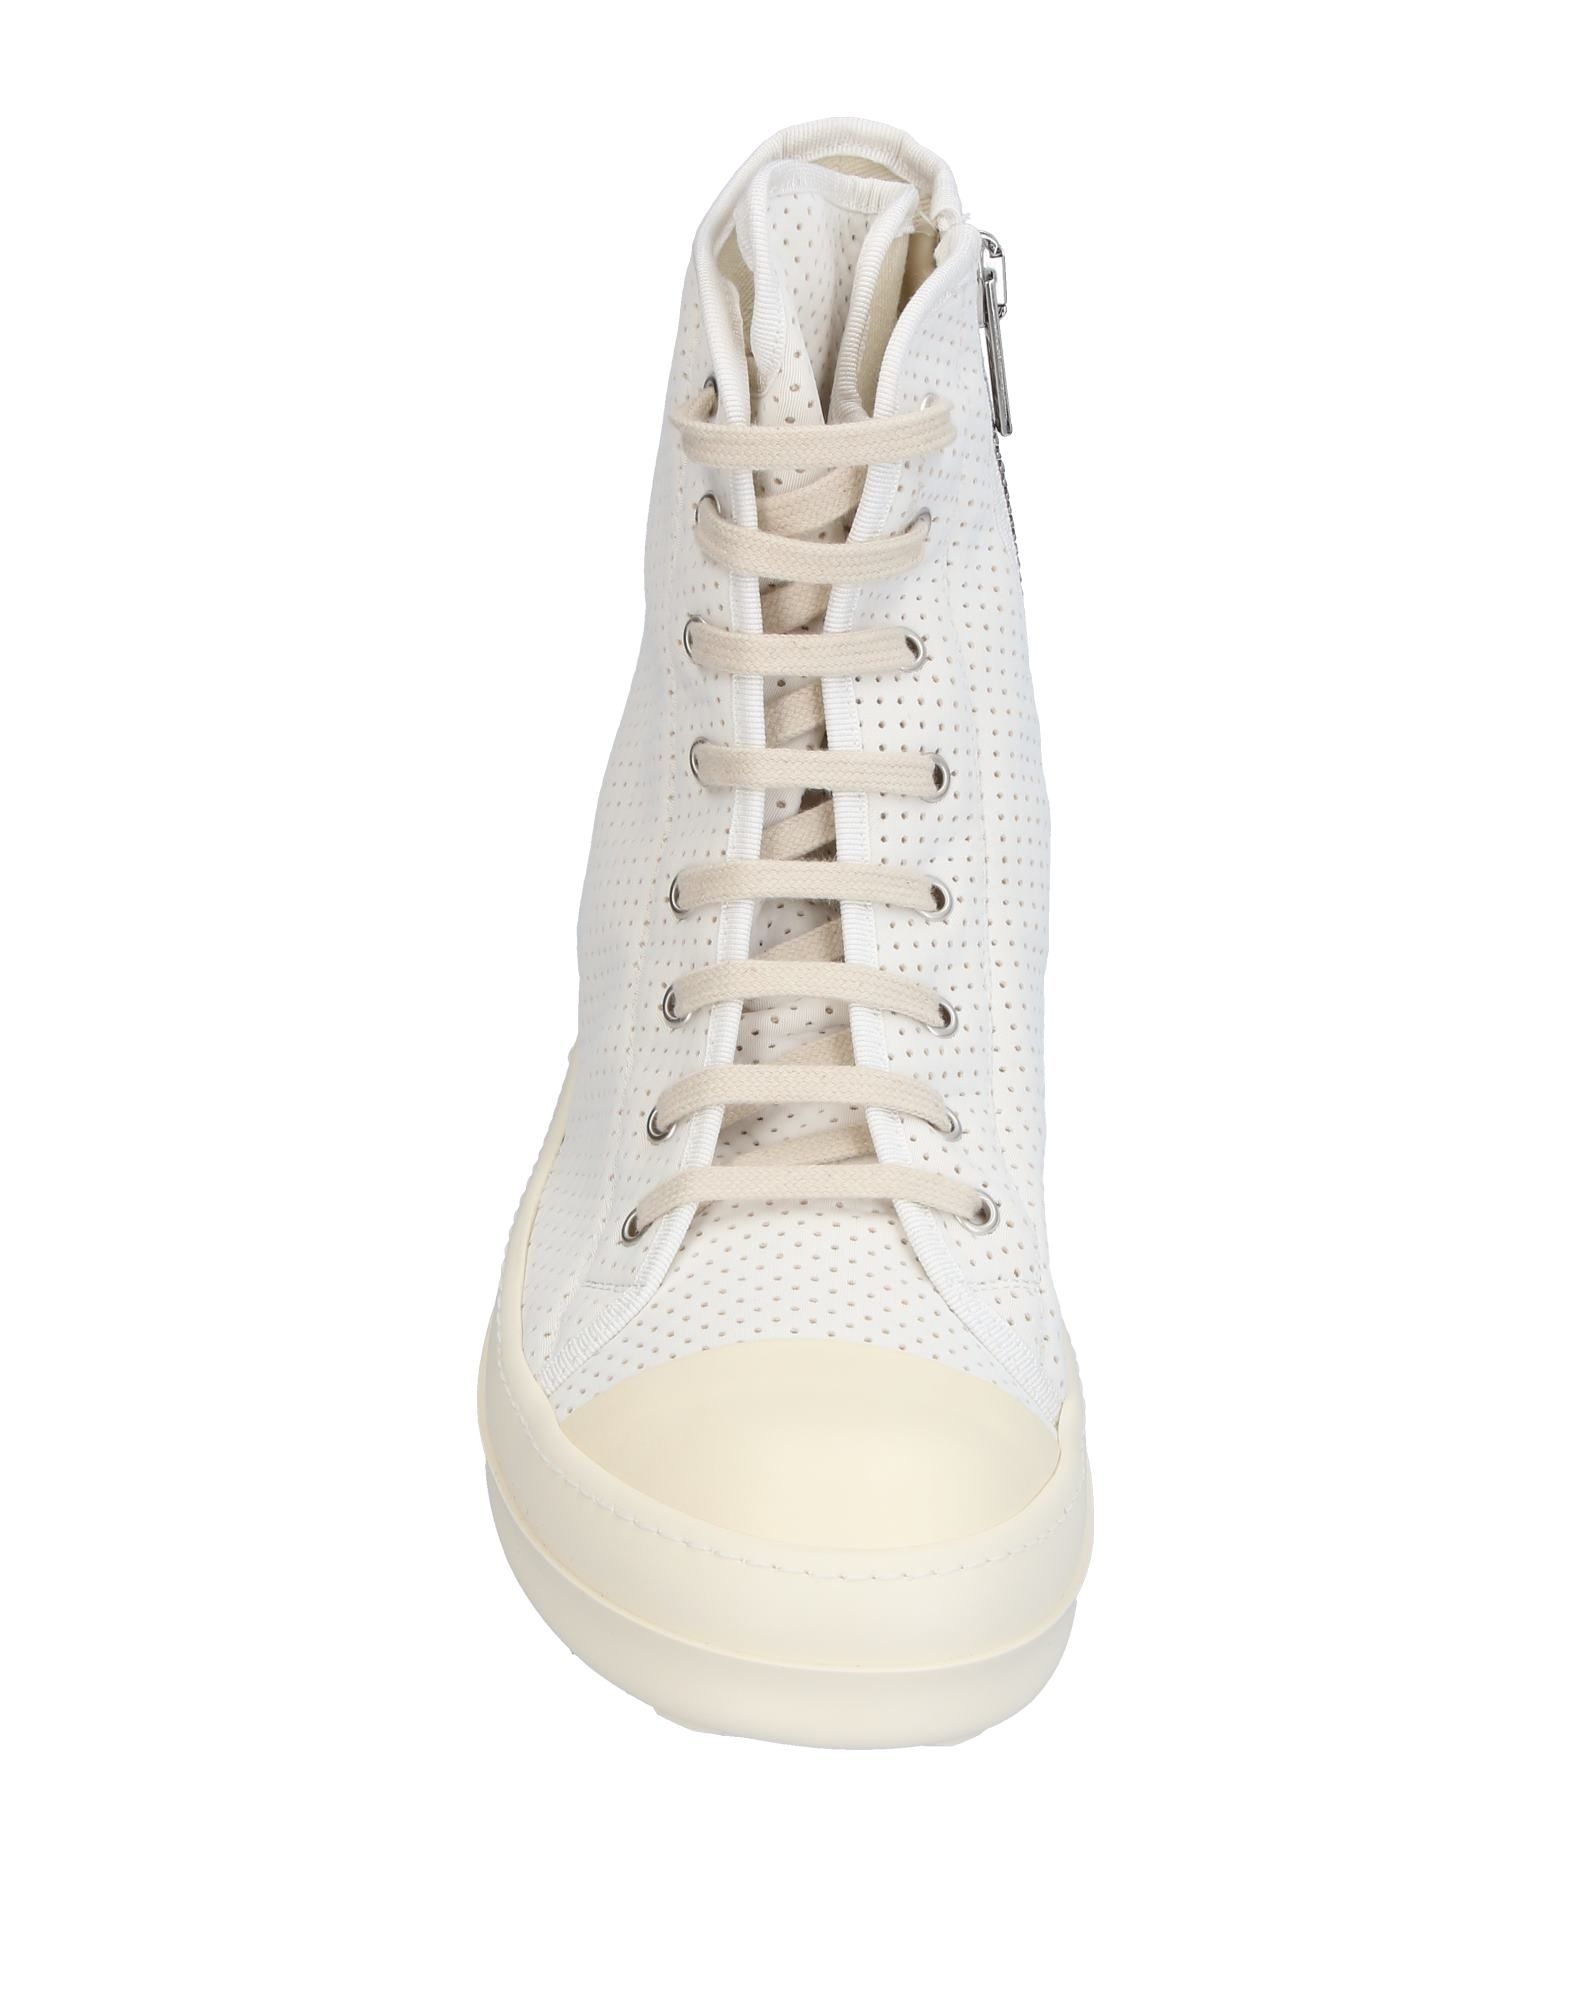 Drkshdw By Rick Owens Sneakers Herren  11354905HT Gute Qualität beliebte Schuhe